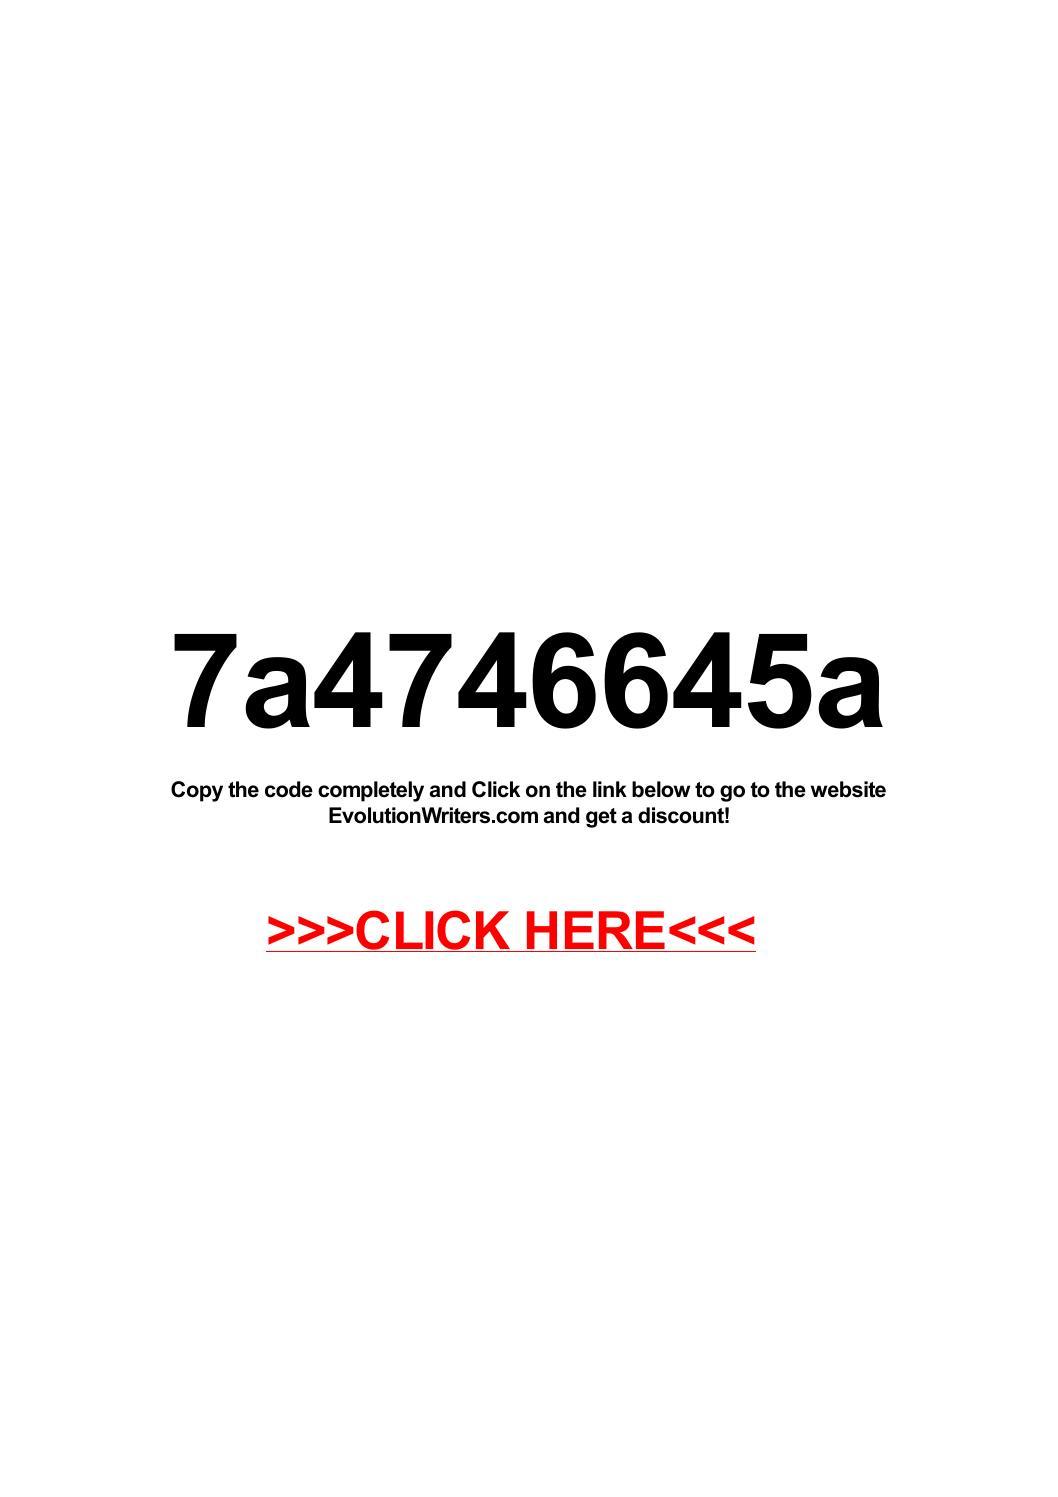 Free homework help chat online